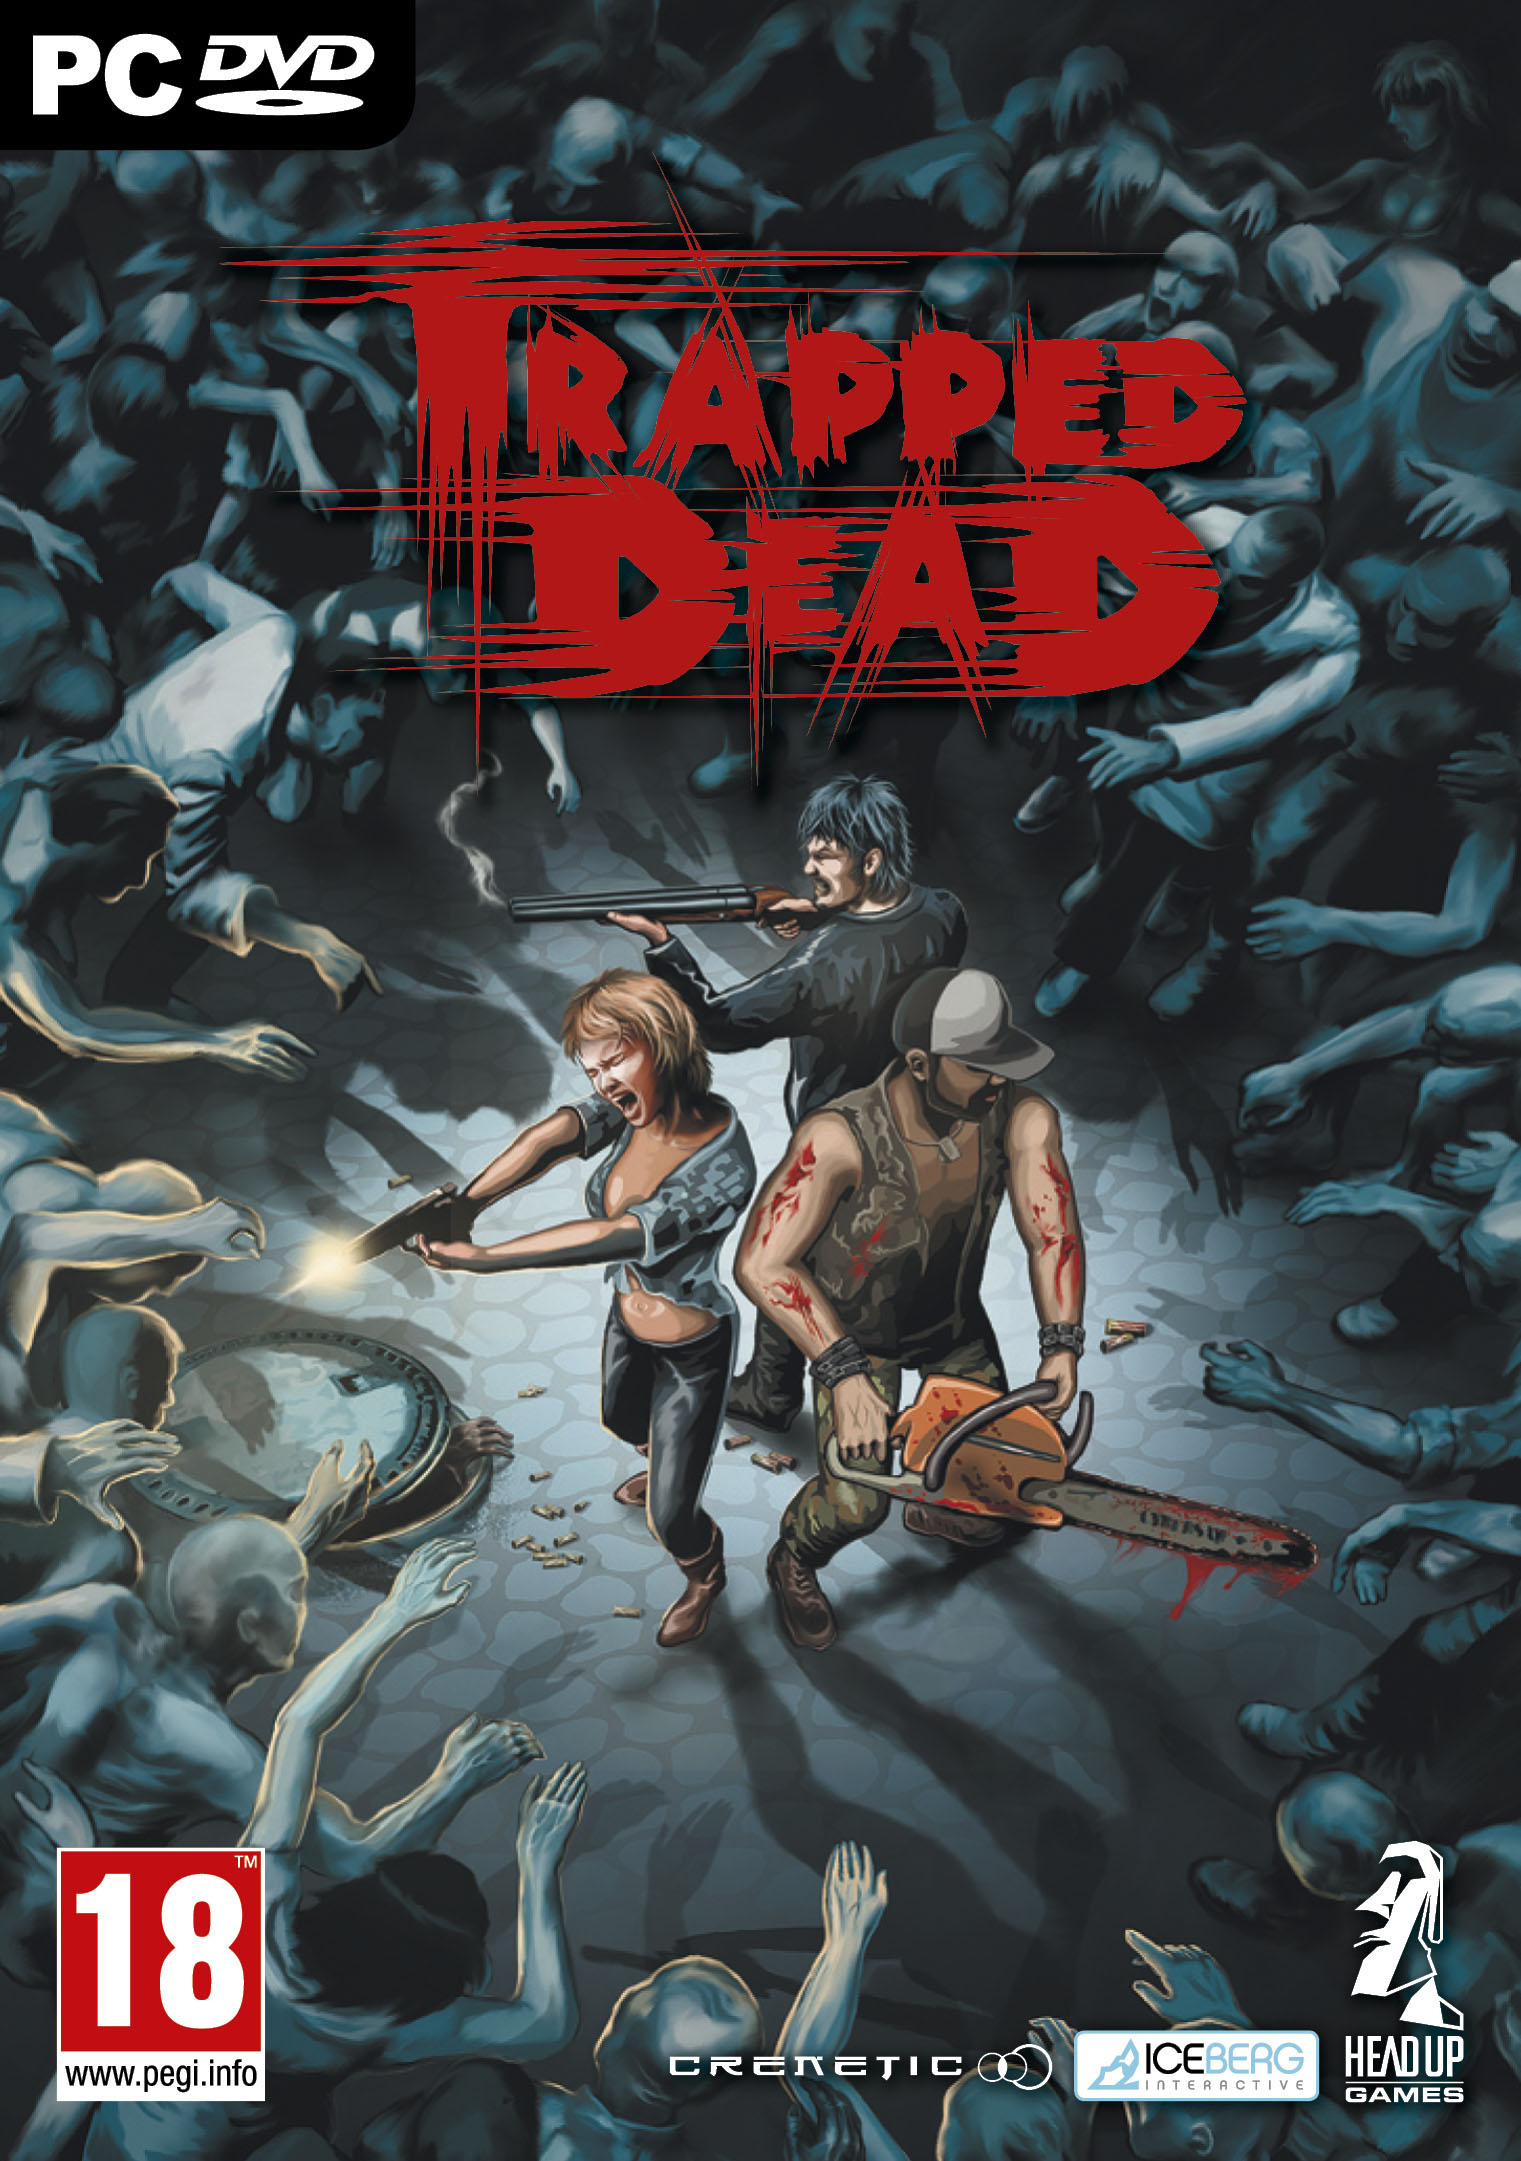 http://brutalgamer.com/wp-content/uploads/2012/04/Trapped-Dead.jpg